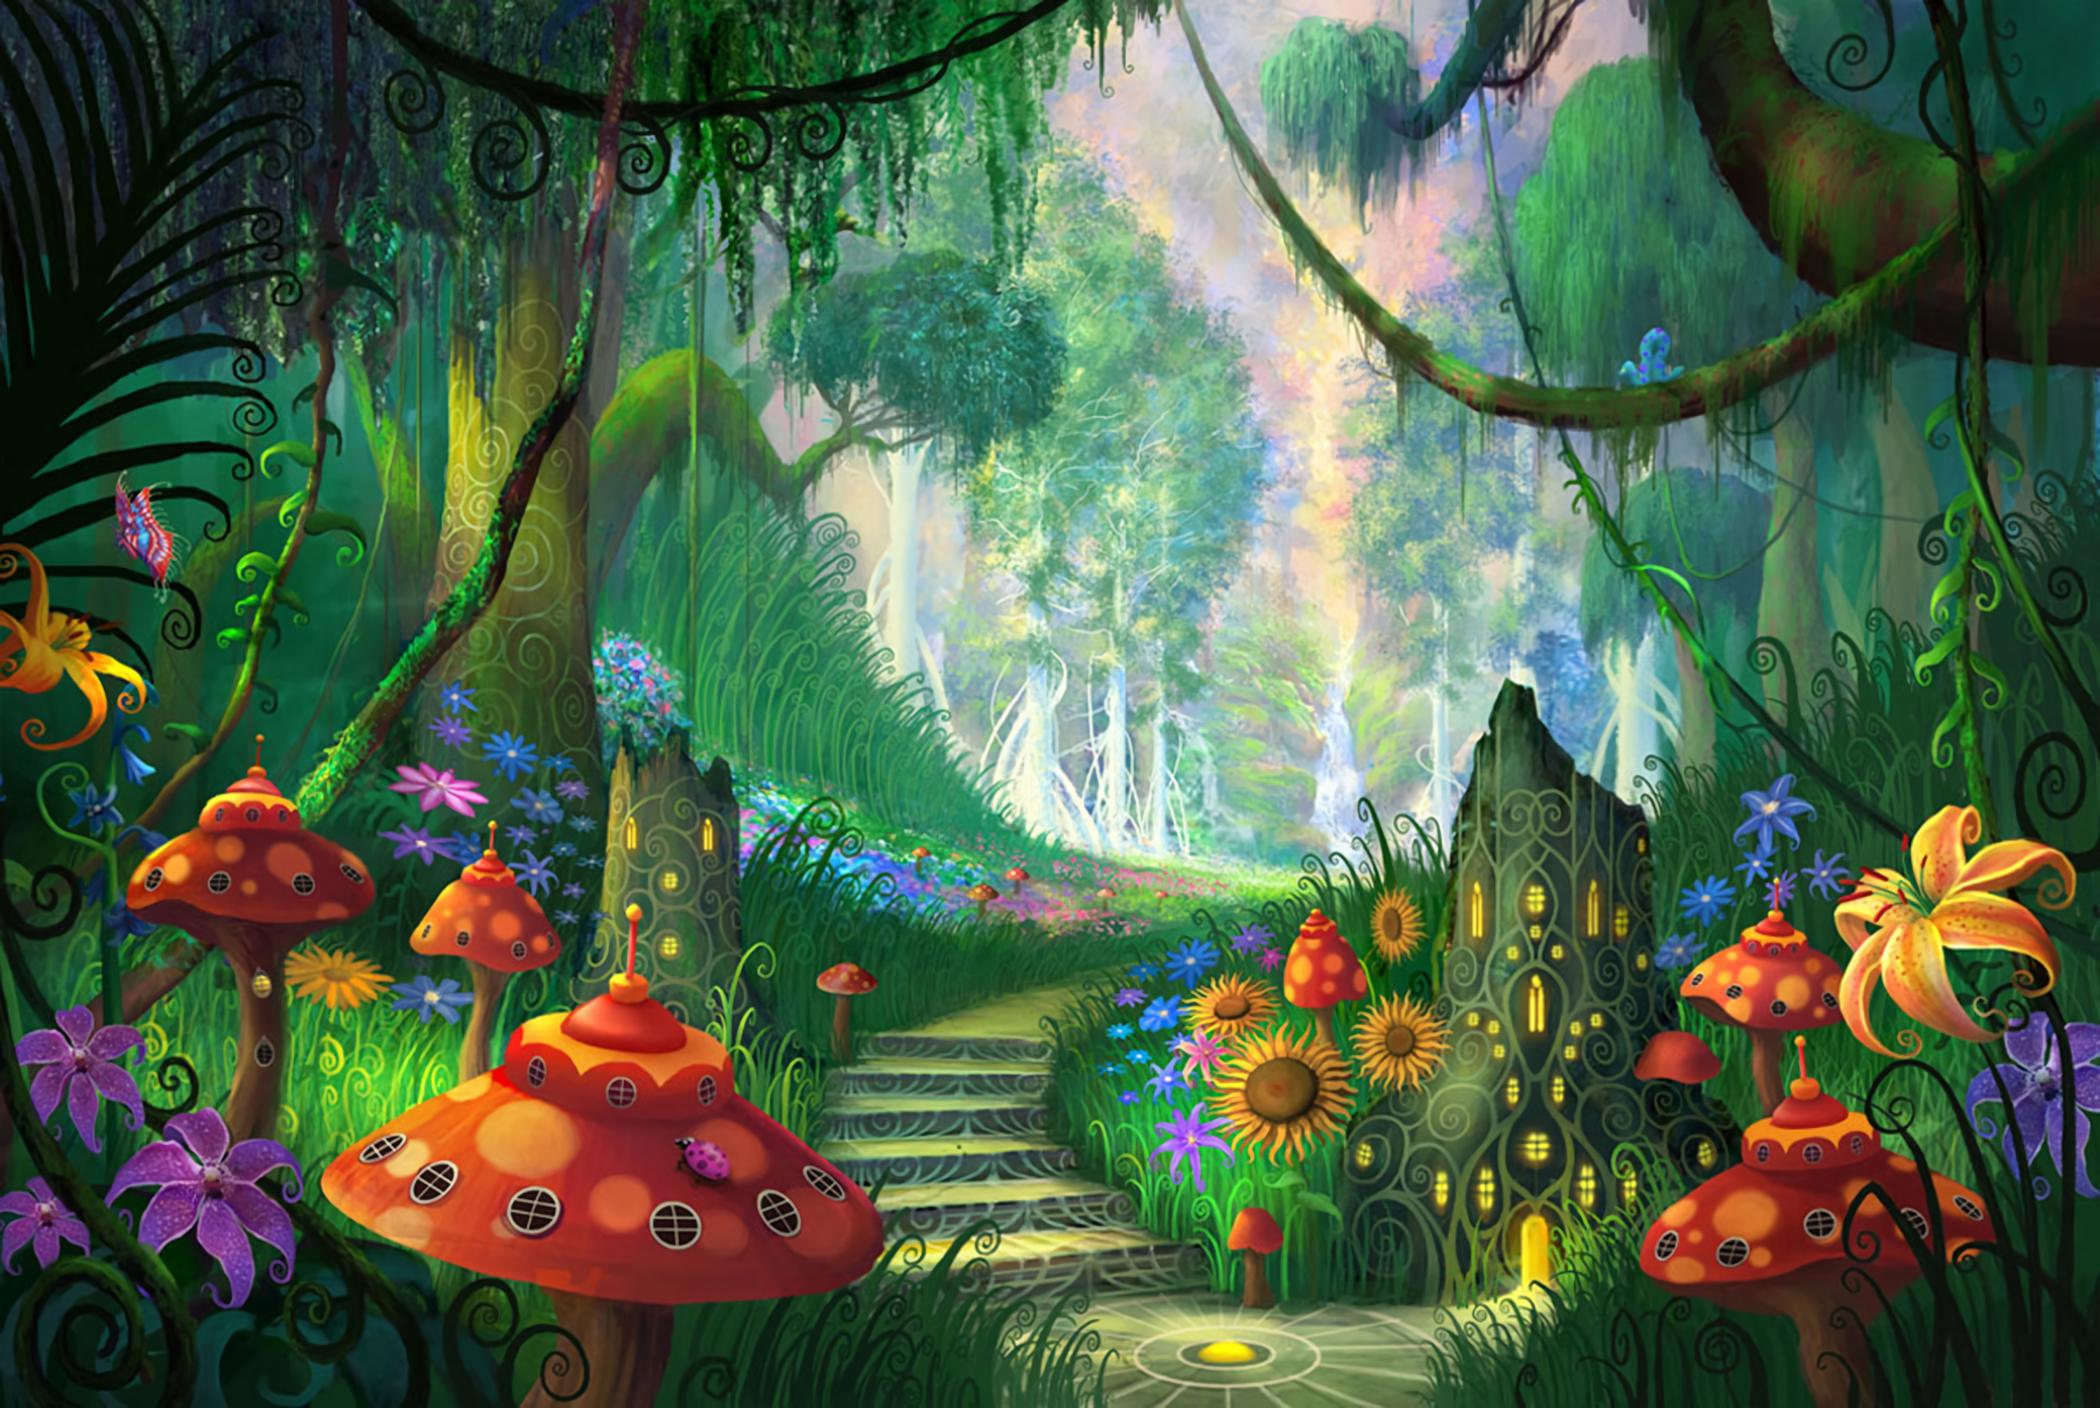 Hd wallpaper jungle - Hd Wallpaper Background Id 842738